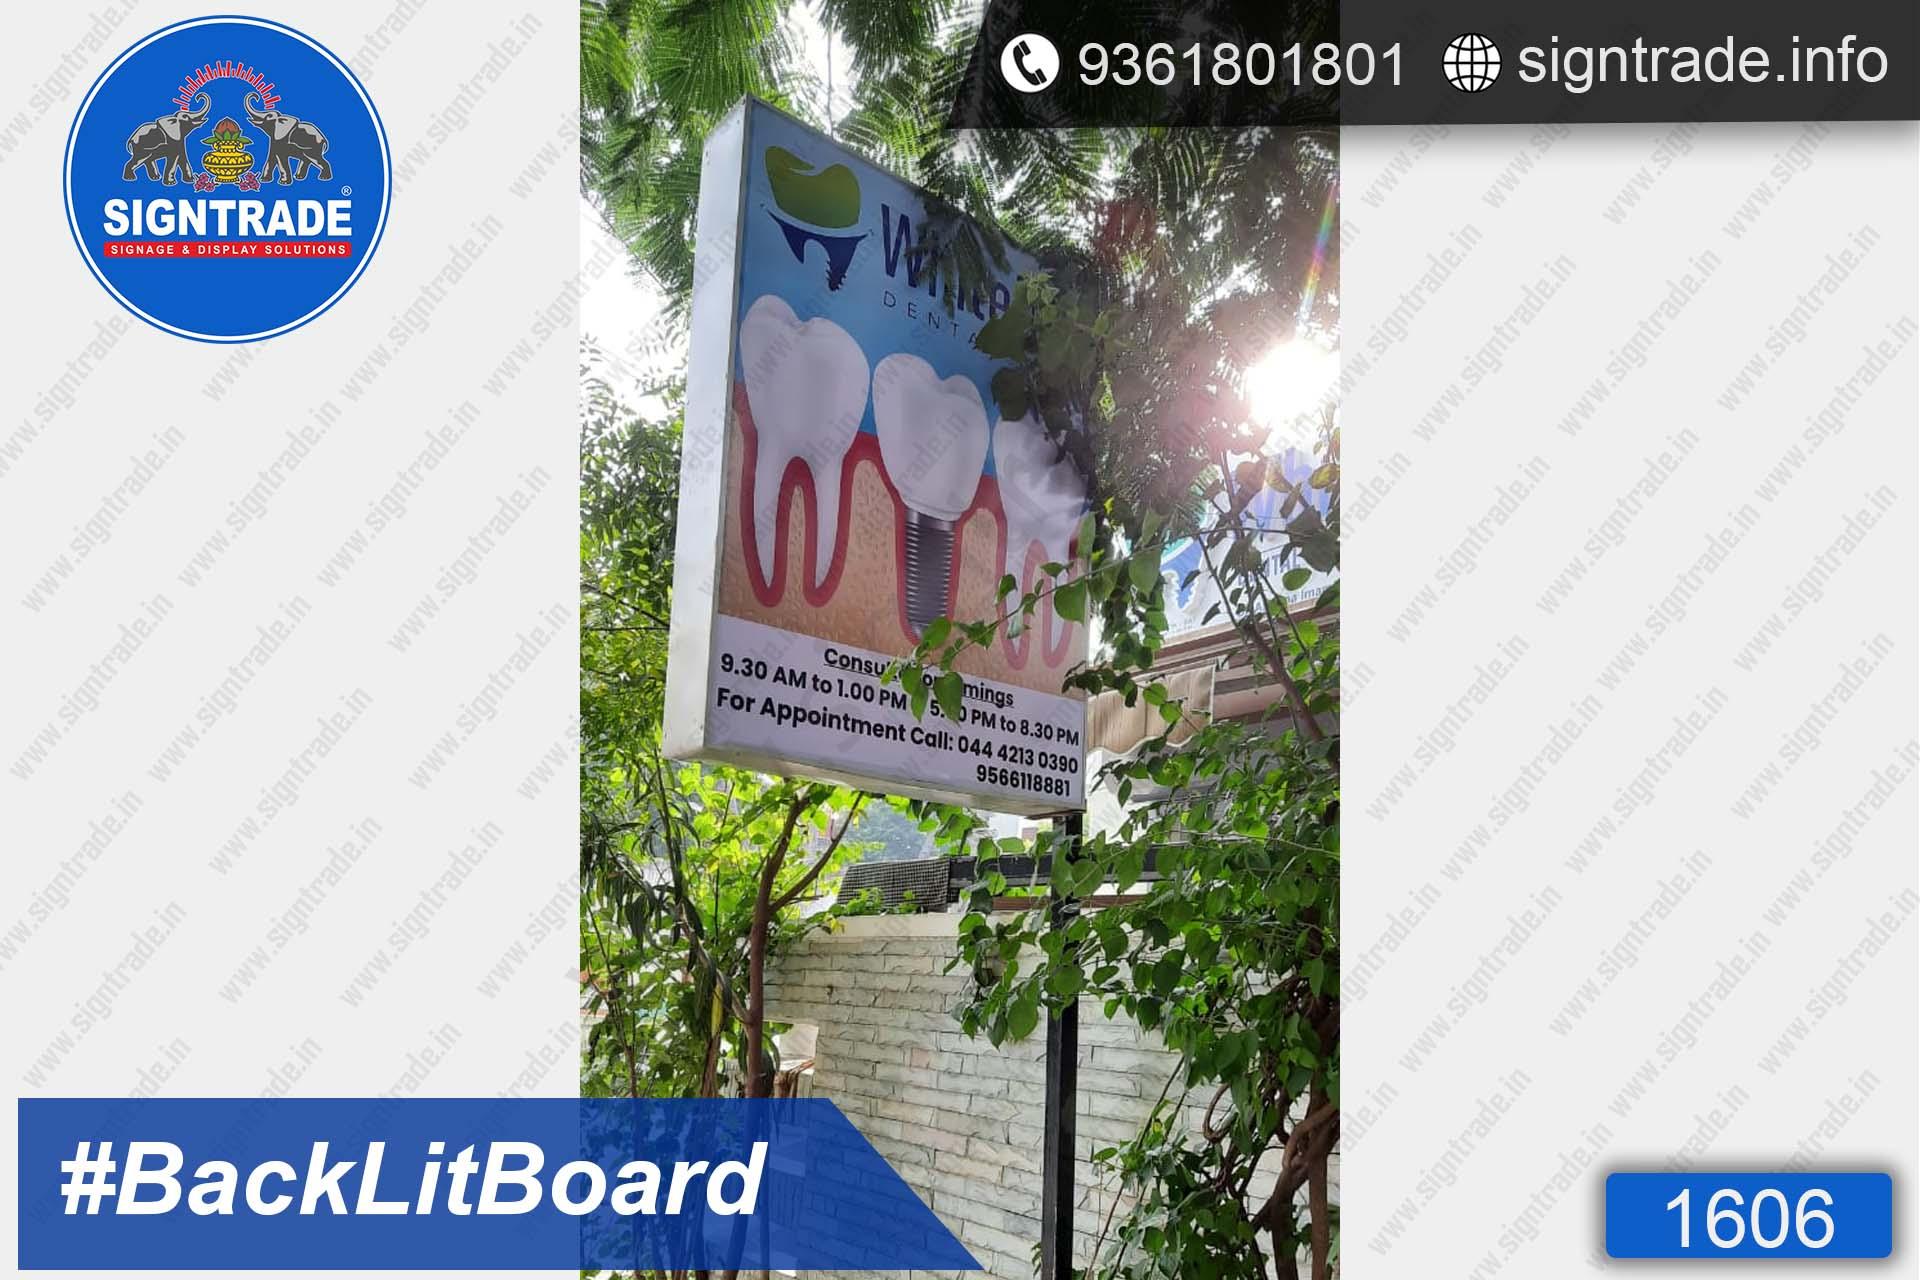 Whiteline Dental Care, Anna nagar, Chennai - SIGNTRADE - Digital Flex Printing Service - Backlit Flex Board Manufacturers in Chennai